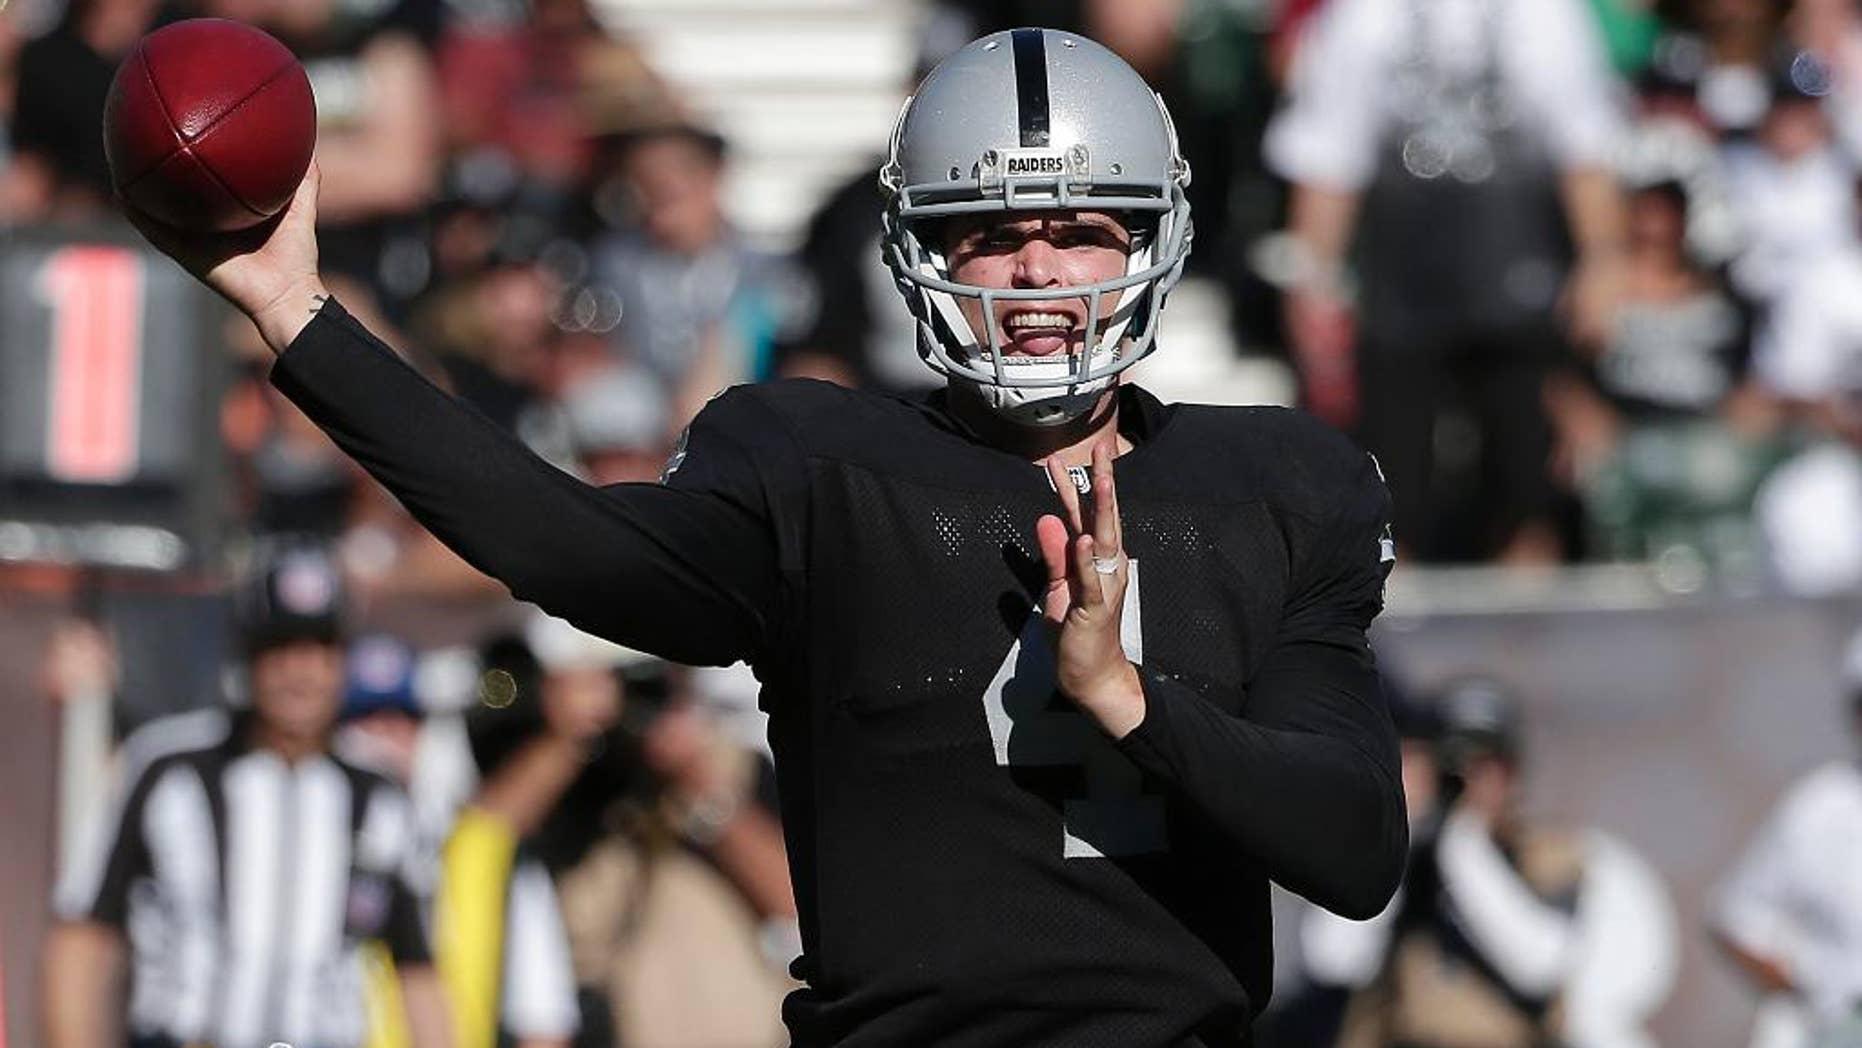 Oakland Raiders quarterback Derek Carr (4) passes against the Arizona Cardinals during the second half of an NFL football game in Oakland, Calif., Sunday, Oct. 19, 2014. The Cardinals won 24-13. (AP Photo/Marcio Jose Sanchez)